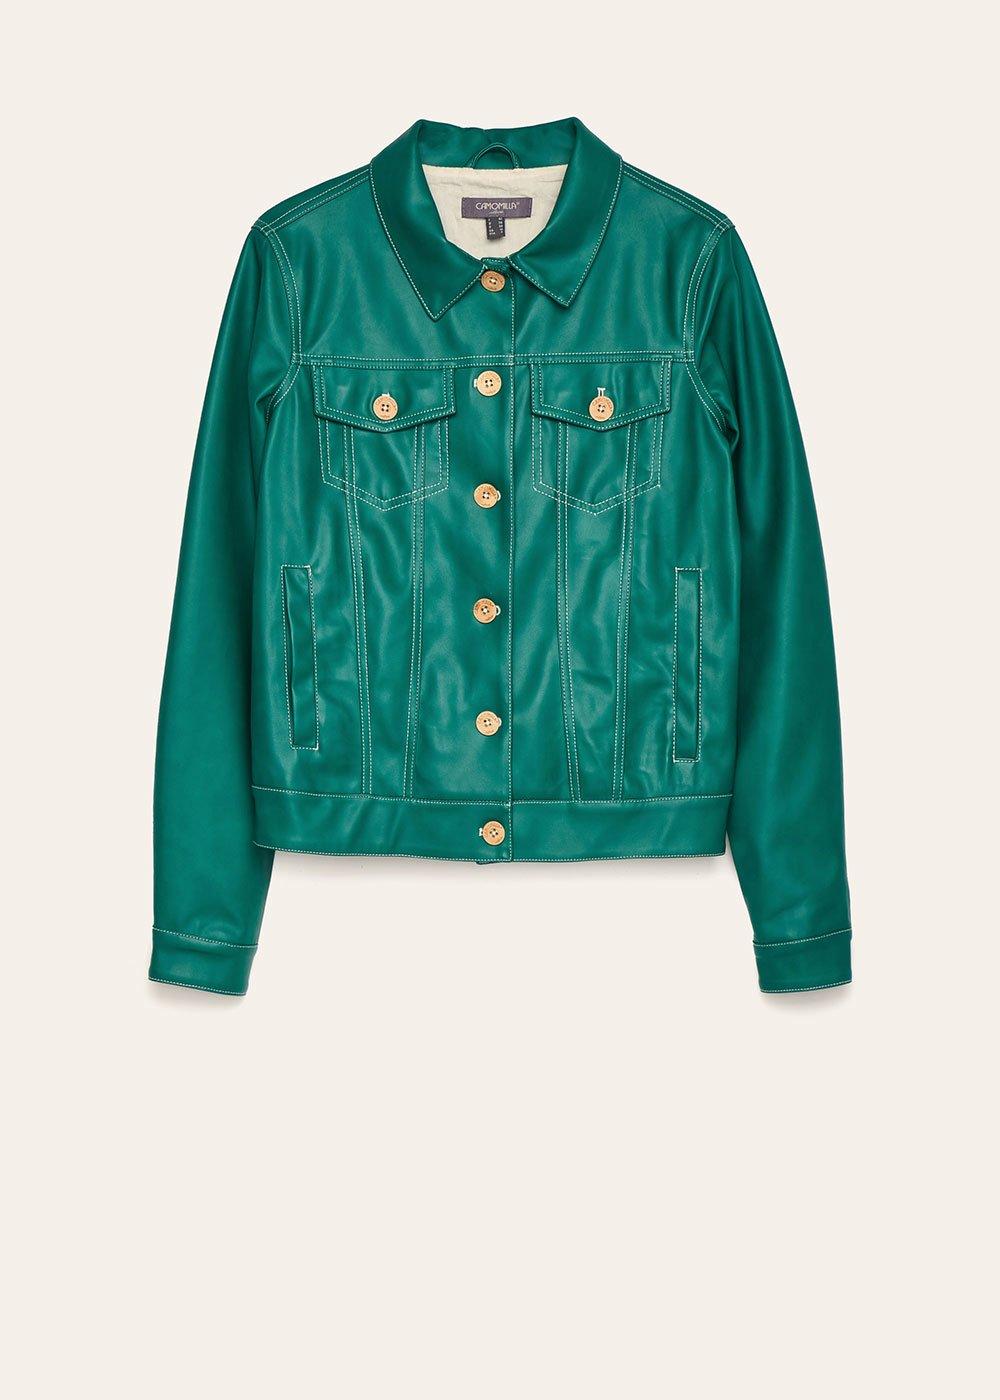 Gomis mint green faux-leather jacket - Menta - Woman